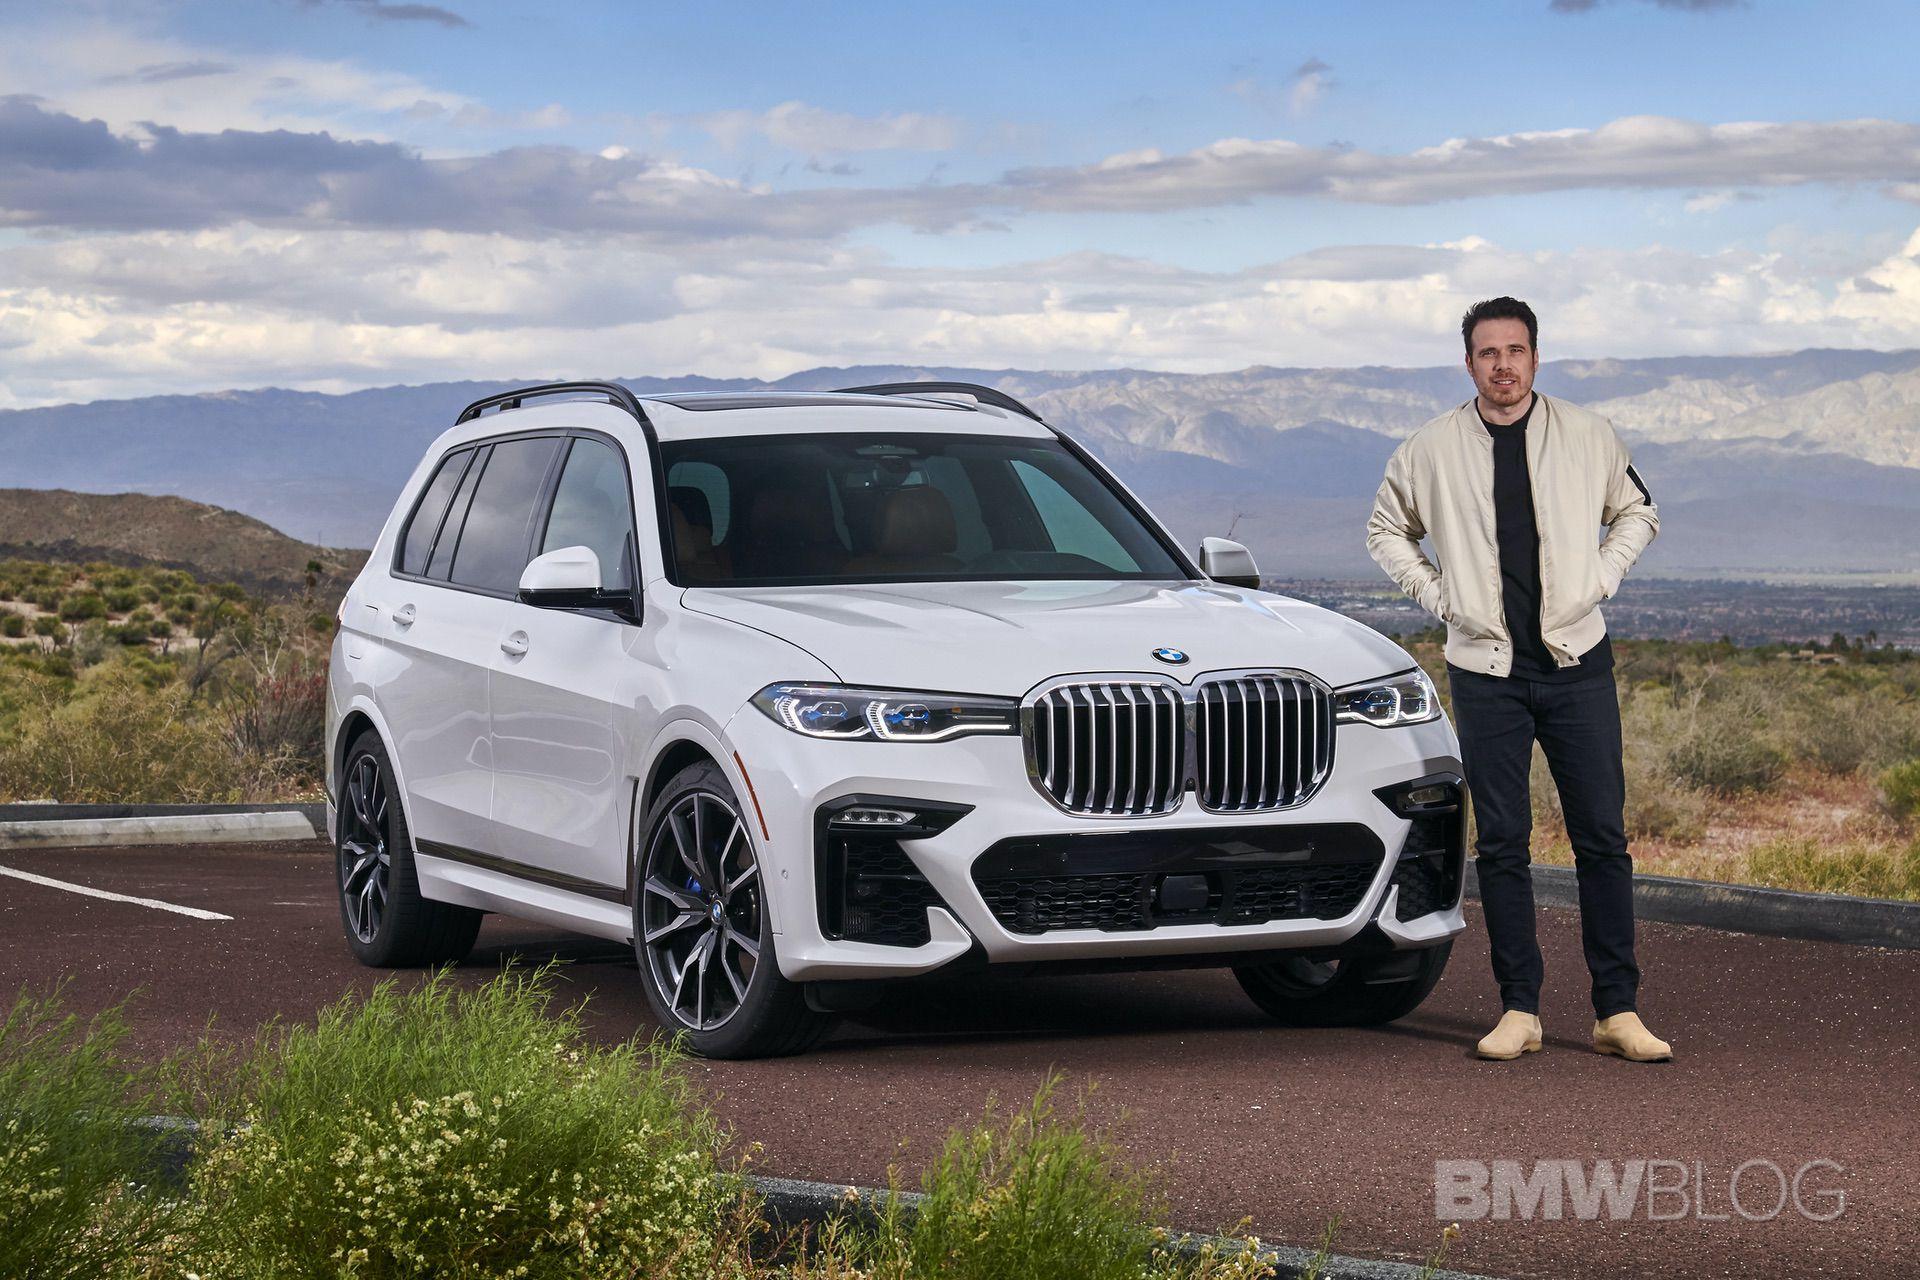 2019 BMW X7 drive 01